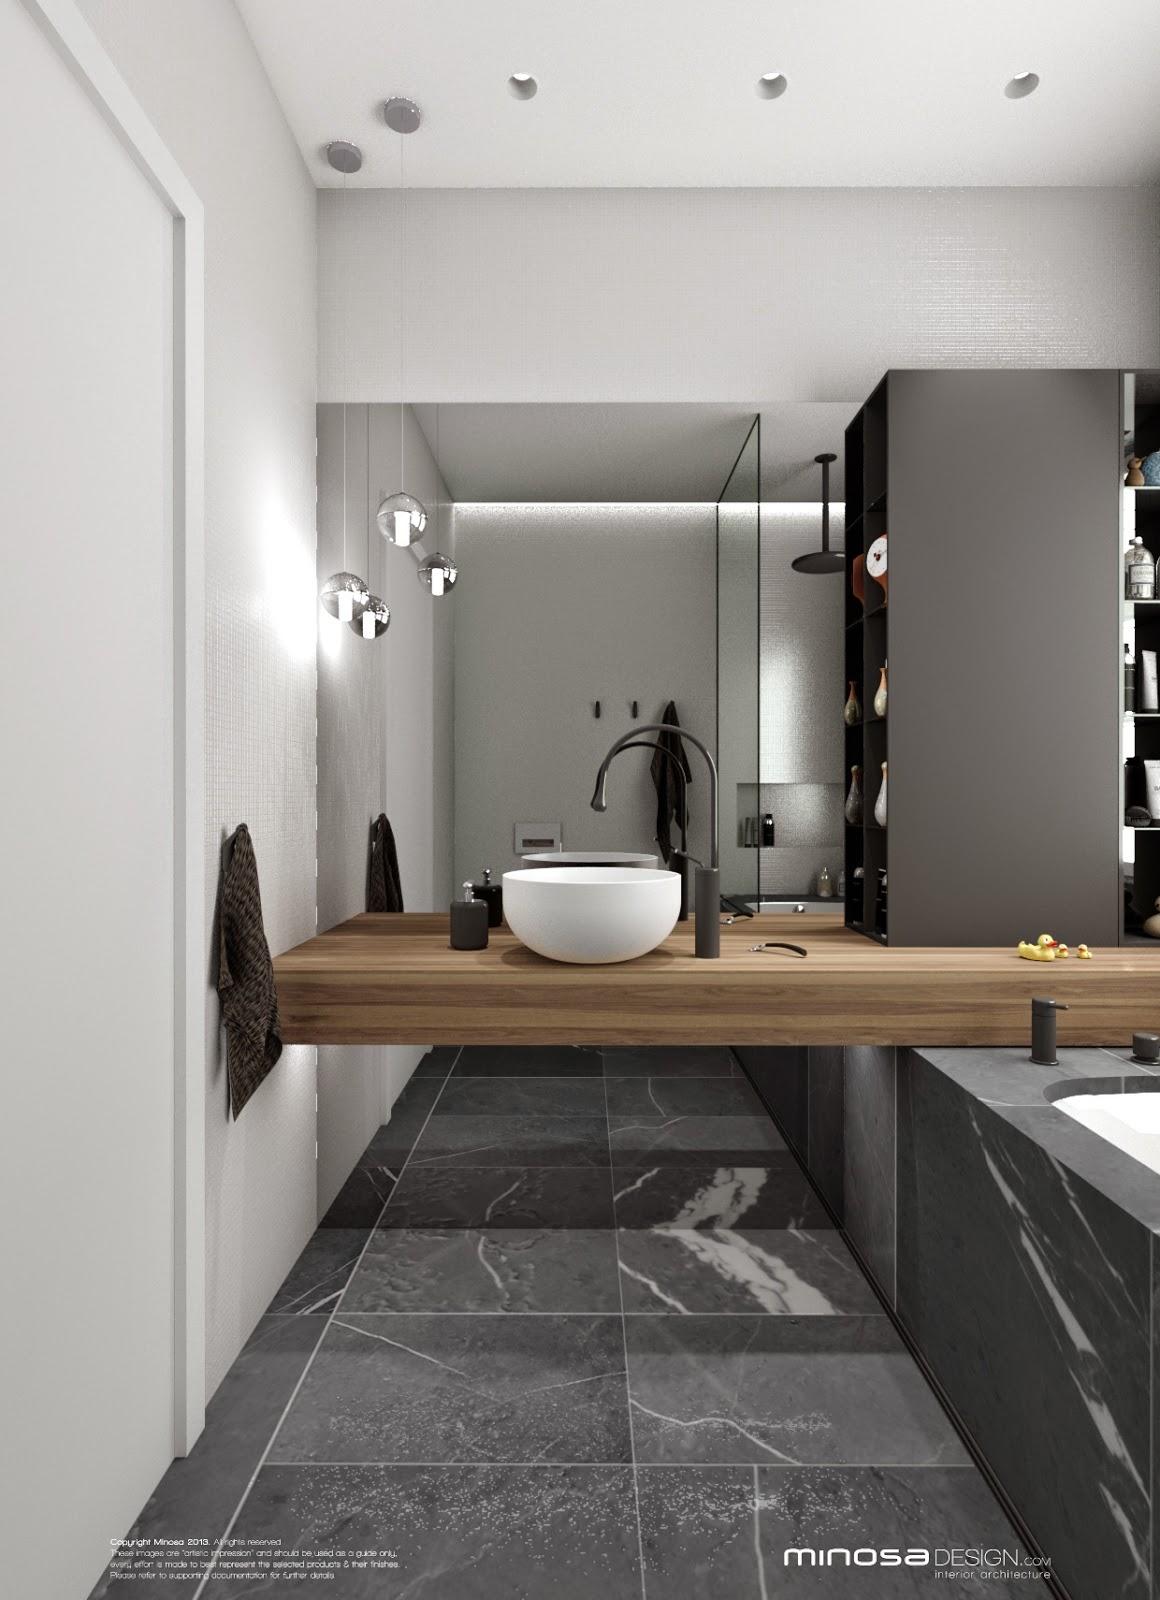 [design a bathroom] - 28 images - bathroom interesting ...